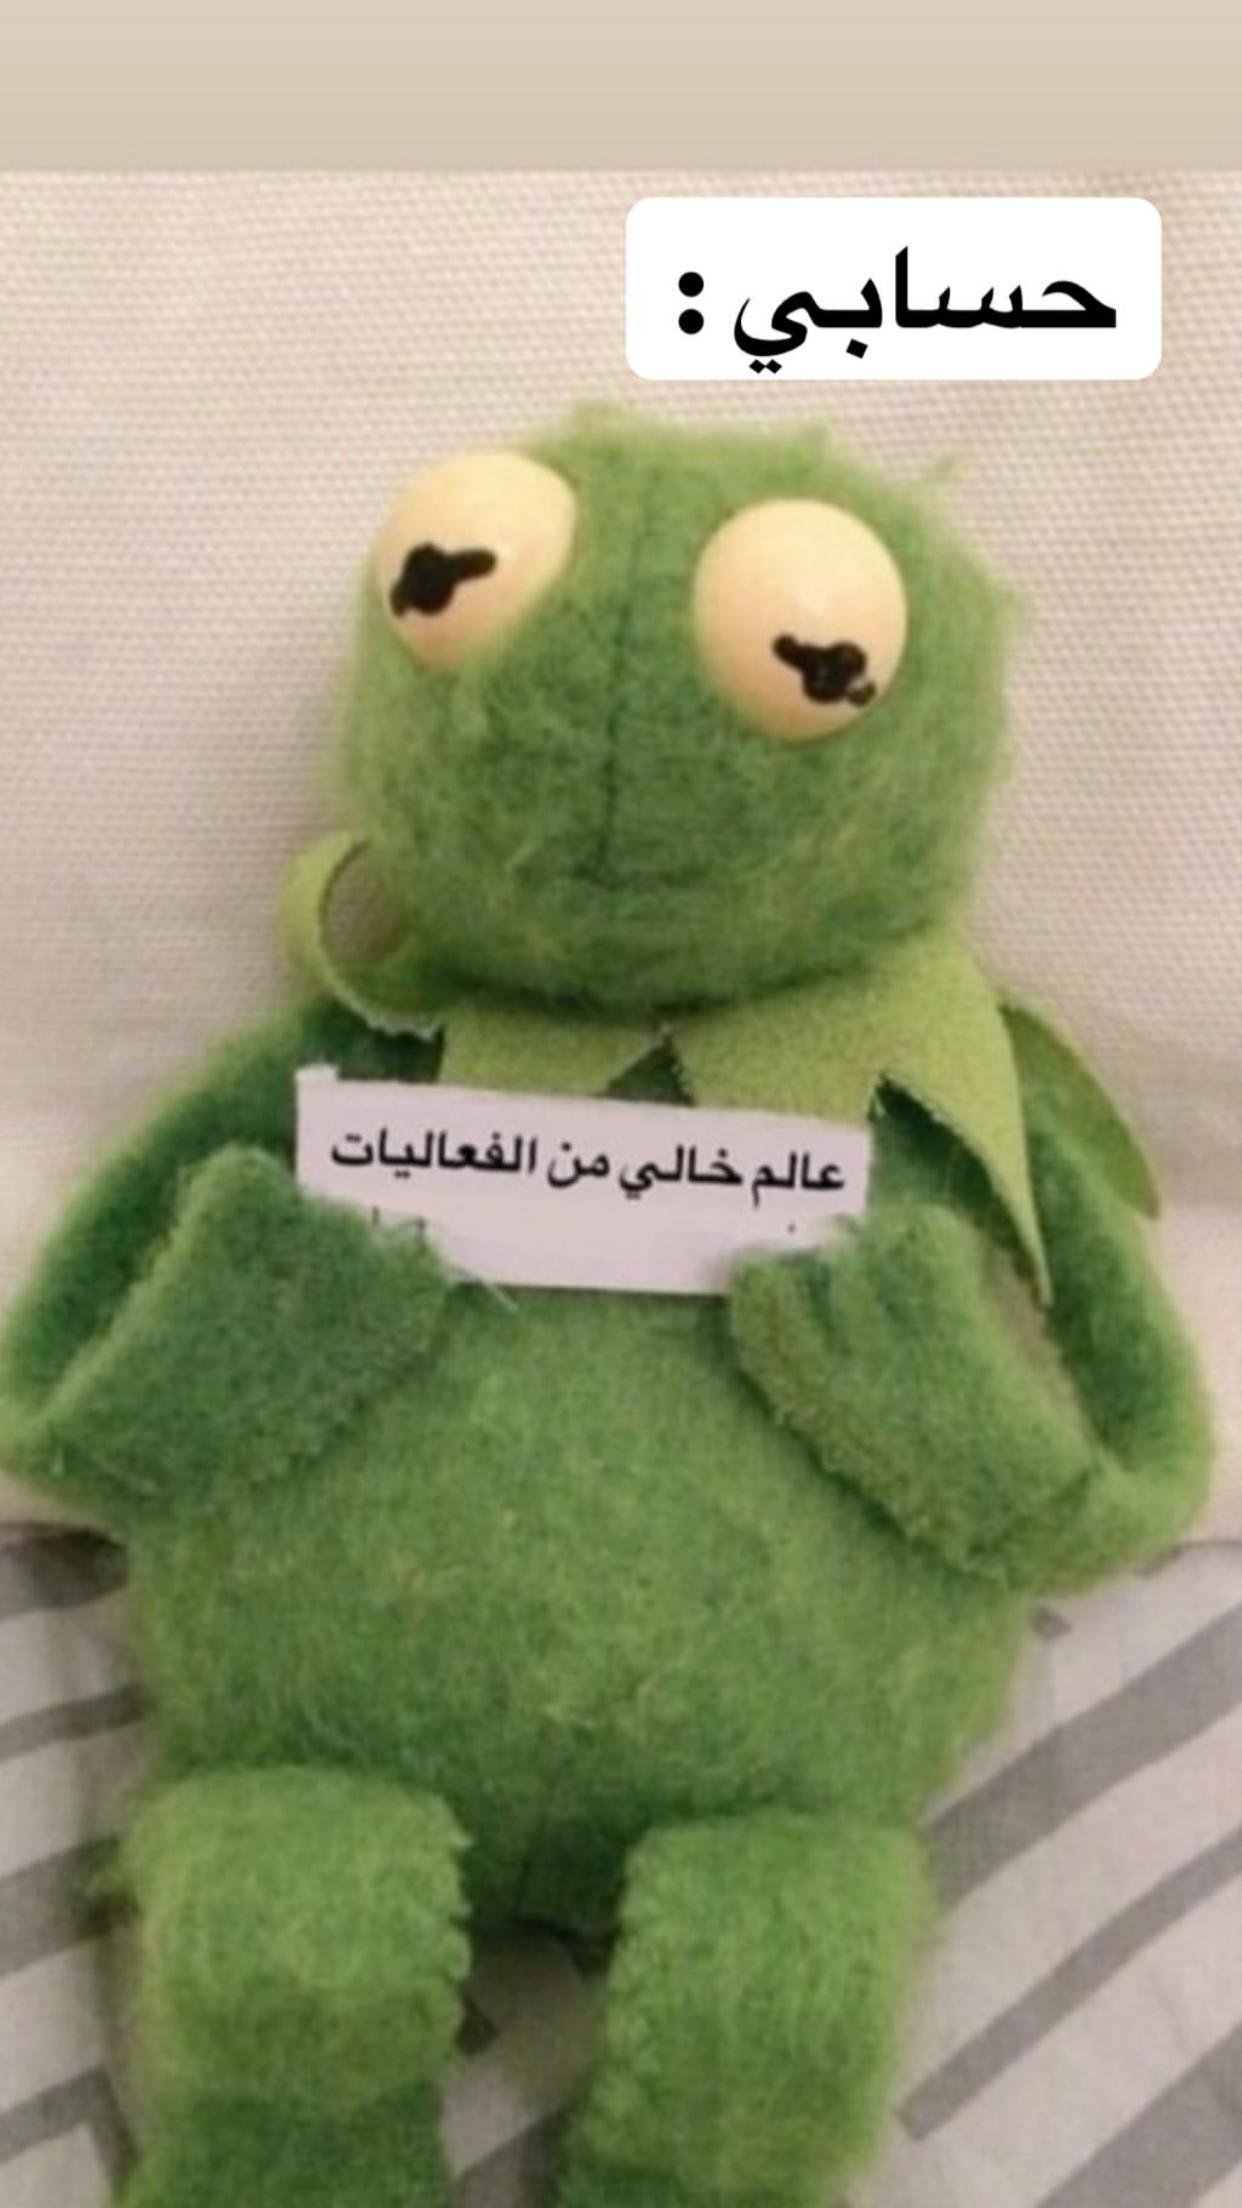 Pin By Edo On فعاليات ميمز Funny Qoutes Dinosaur Arabic Memes